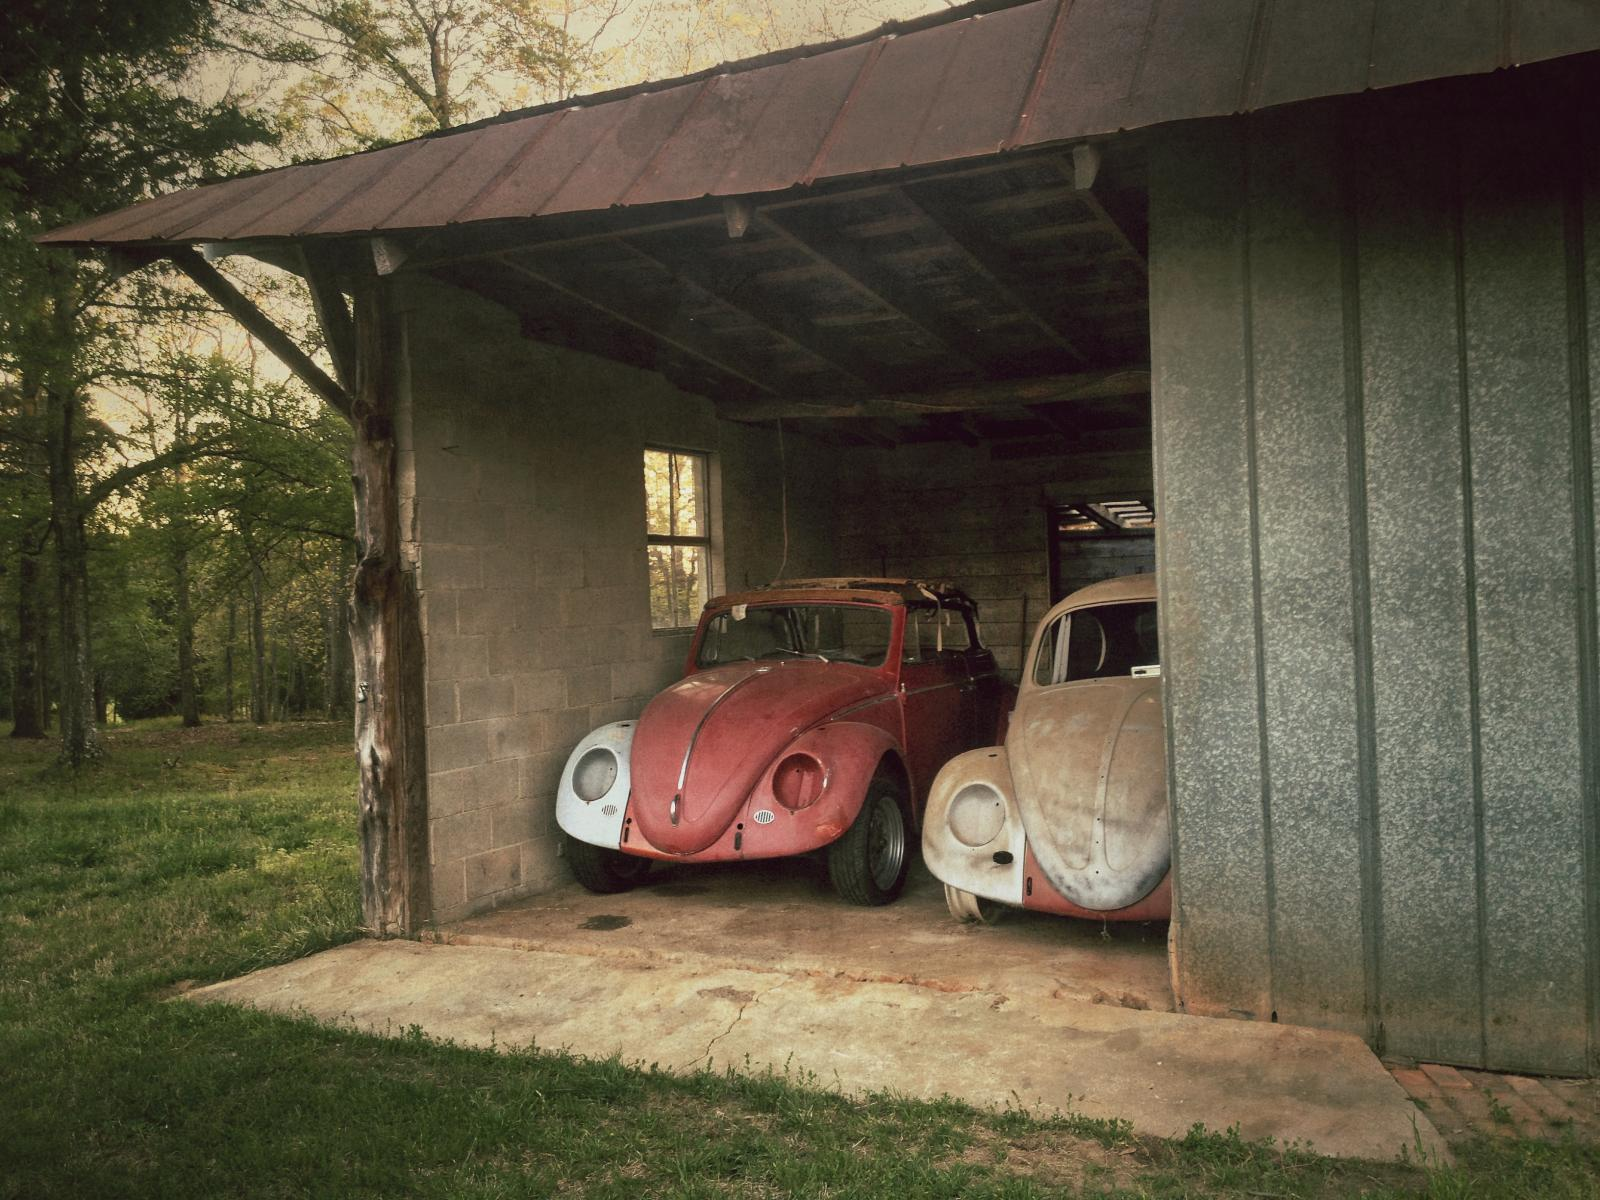 '63 Vert and '66 Sedan